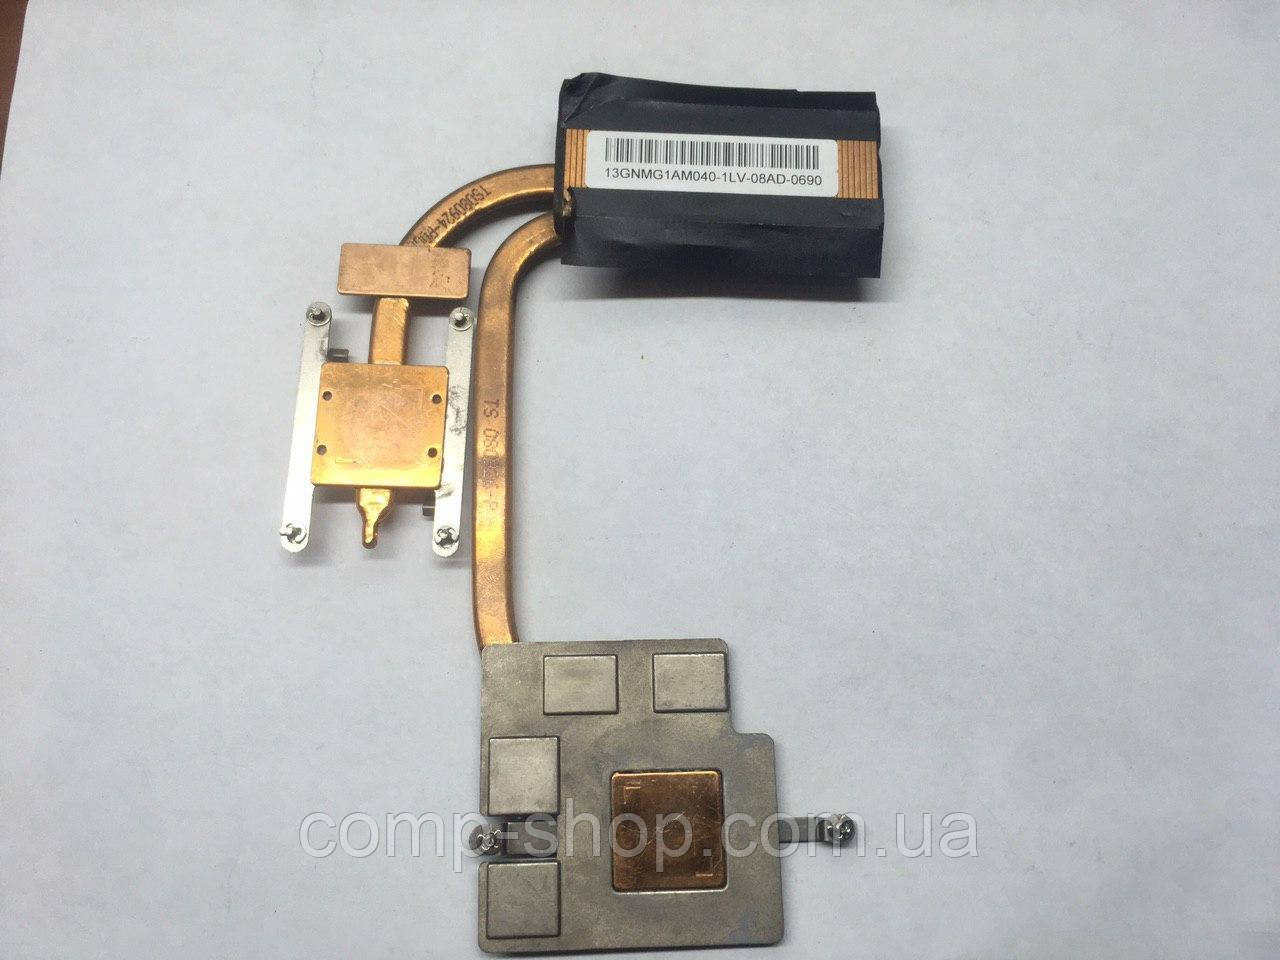 БУ Радиатор Lenovo Y510 13GNMG1AM040 (Оригинал)